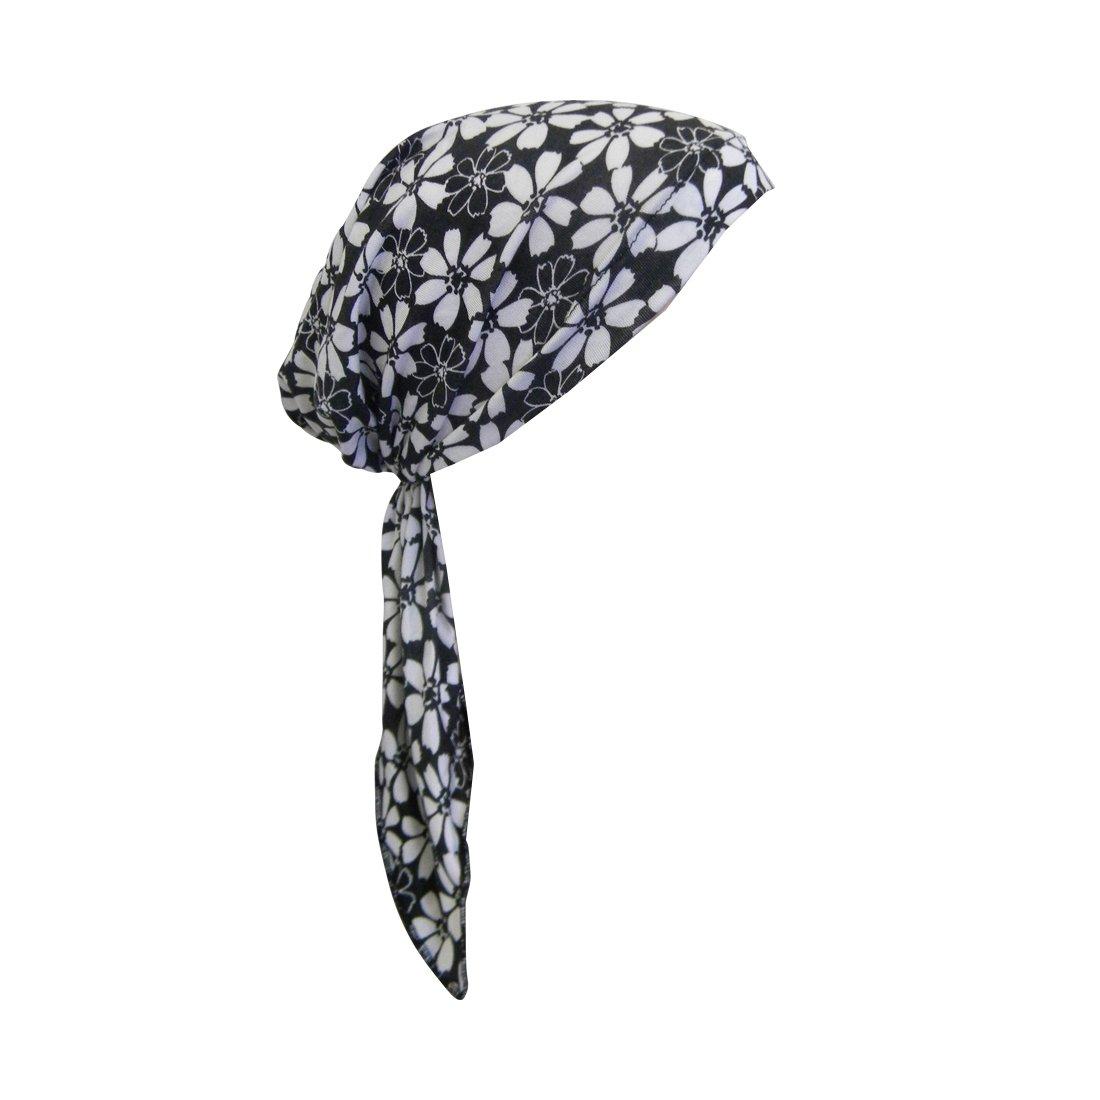 Purple Flowers Pretied Head Scarf Cancer Chemo Cap Printed Headcover Landana Headscarves ldpt-33